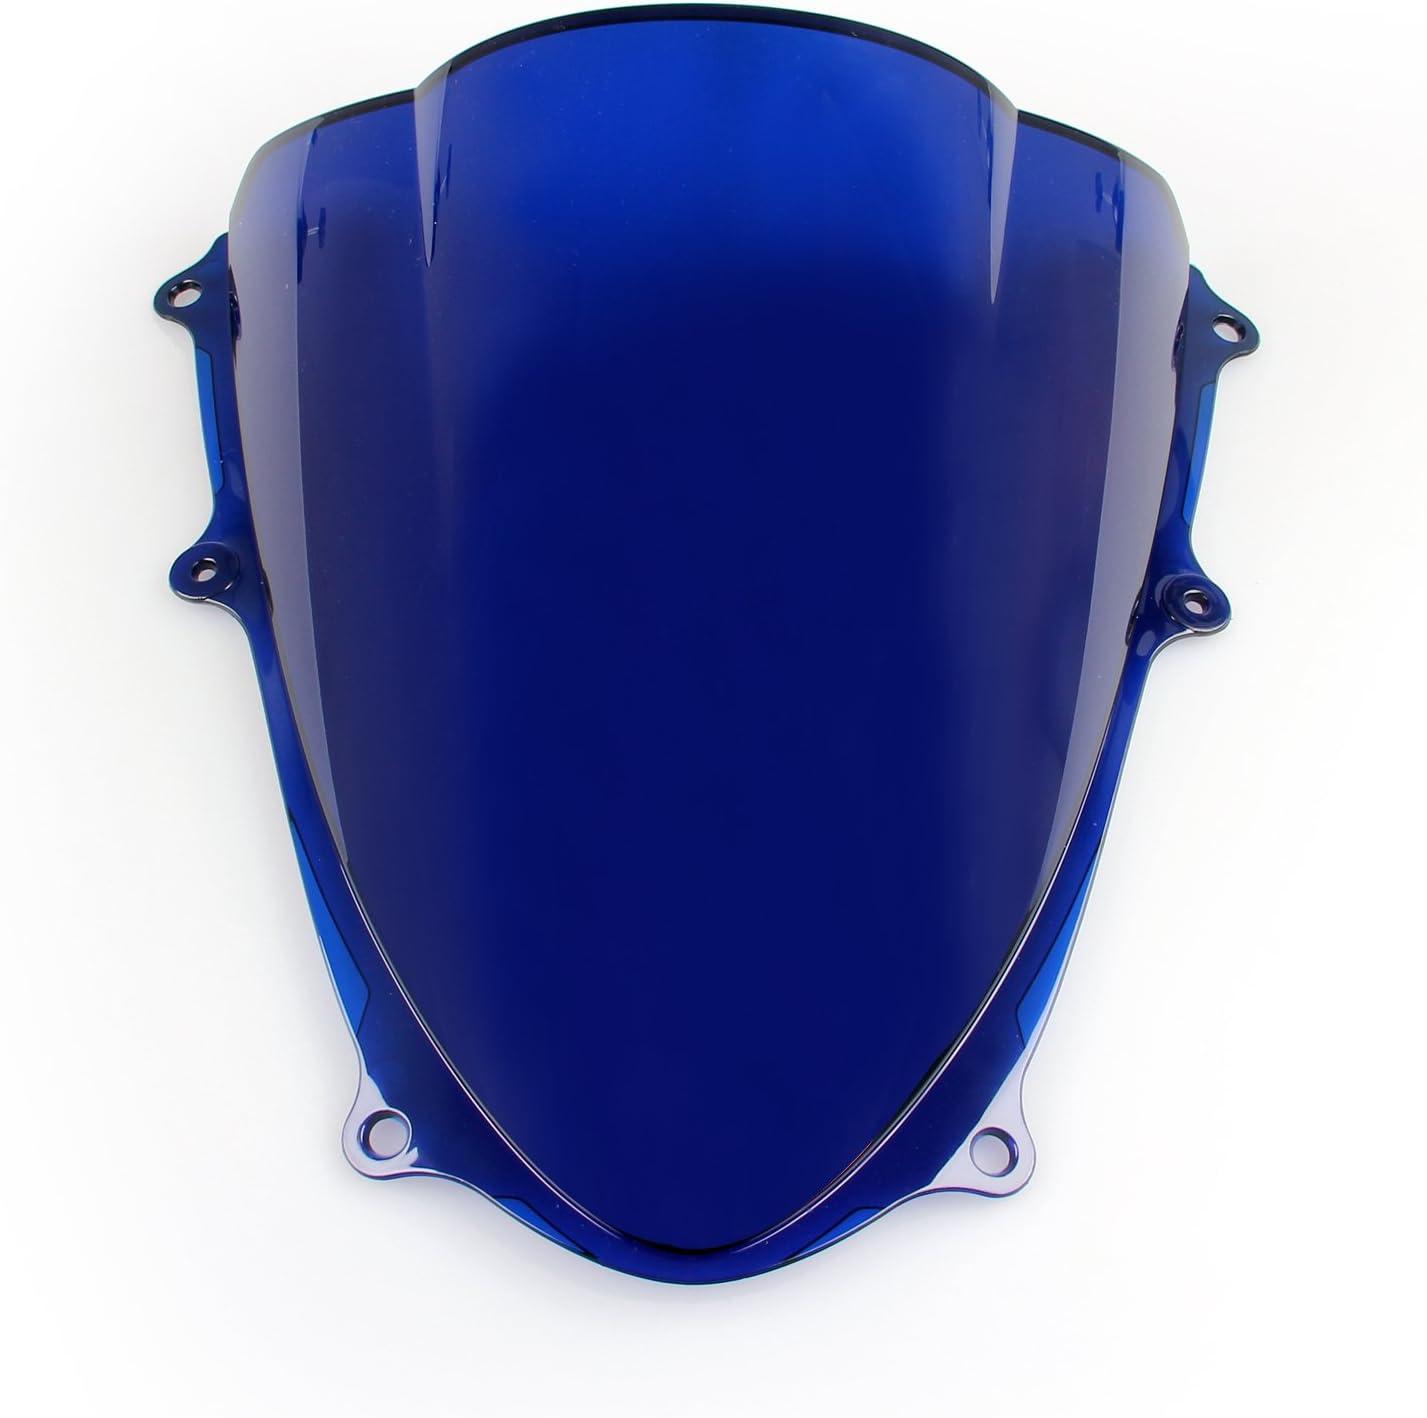 Topteng Motorcycle Windshield,Sport Windscreen with ABS Aerodynamic Design for Su-zu-ki GSXR 1000 2009-2016 K9